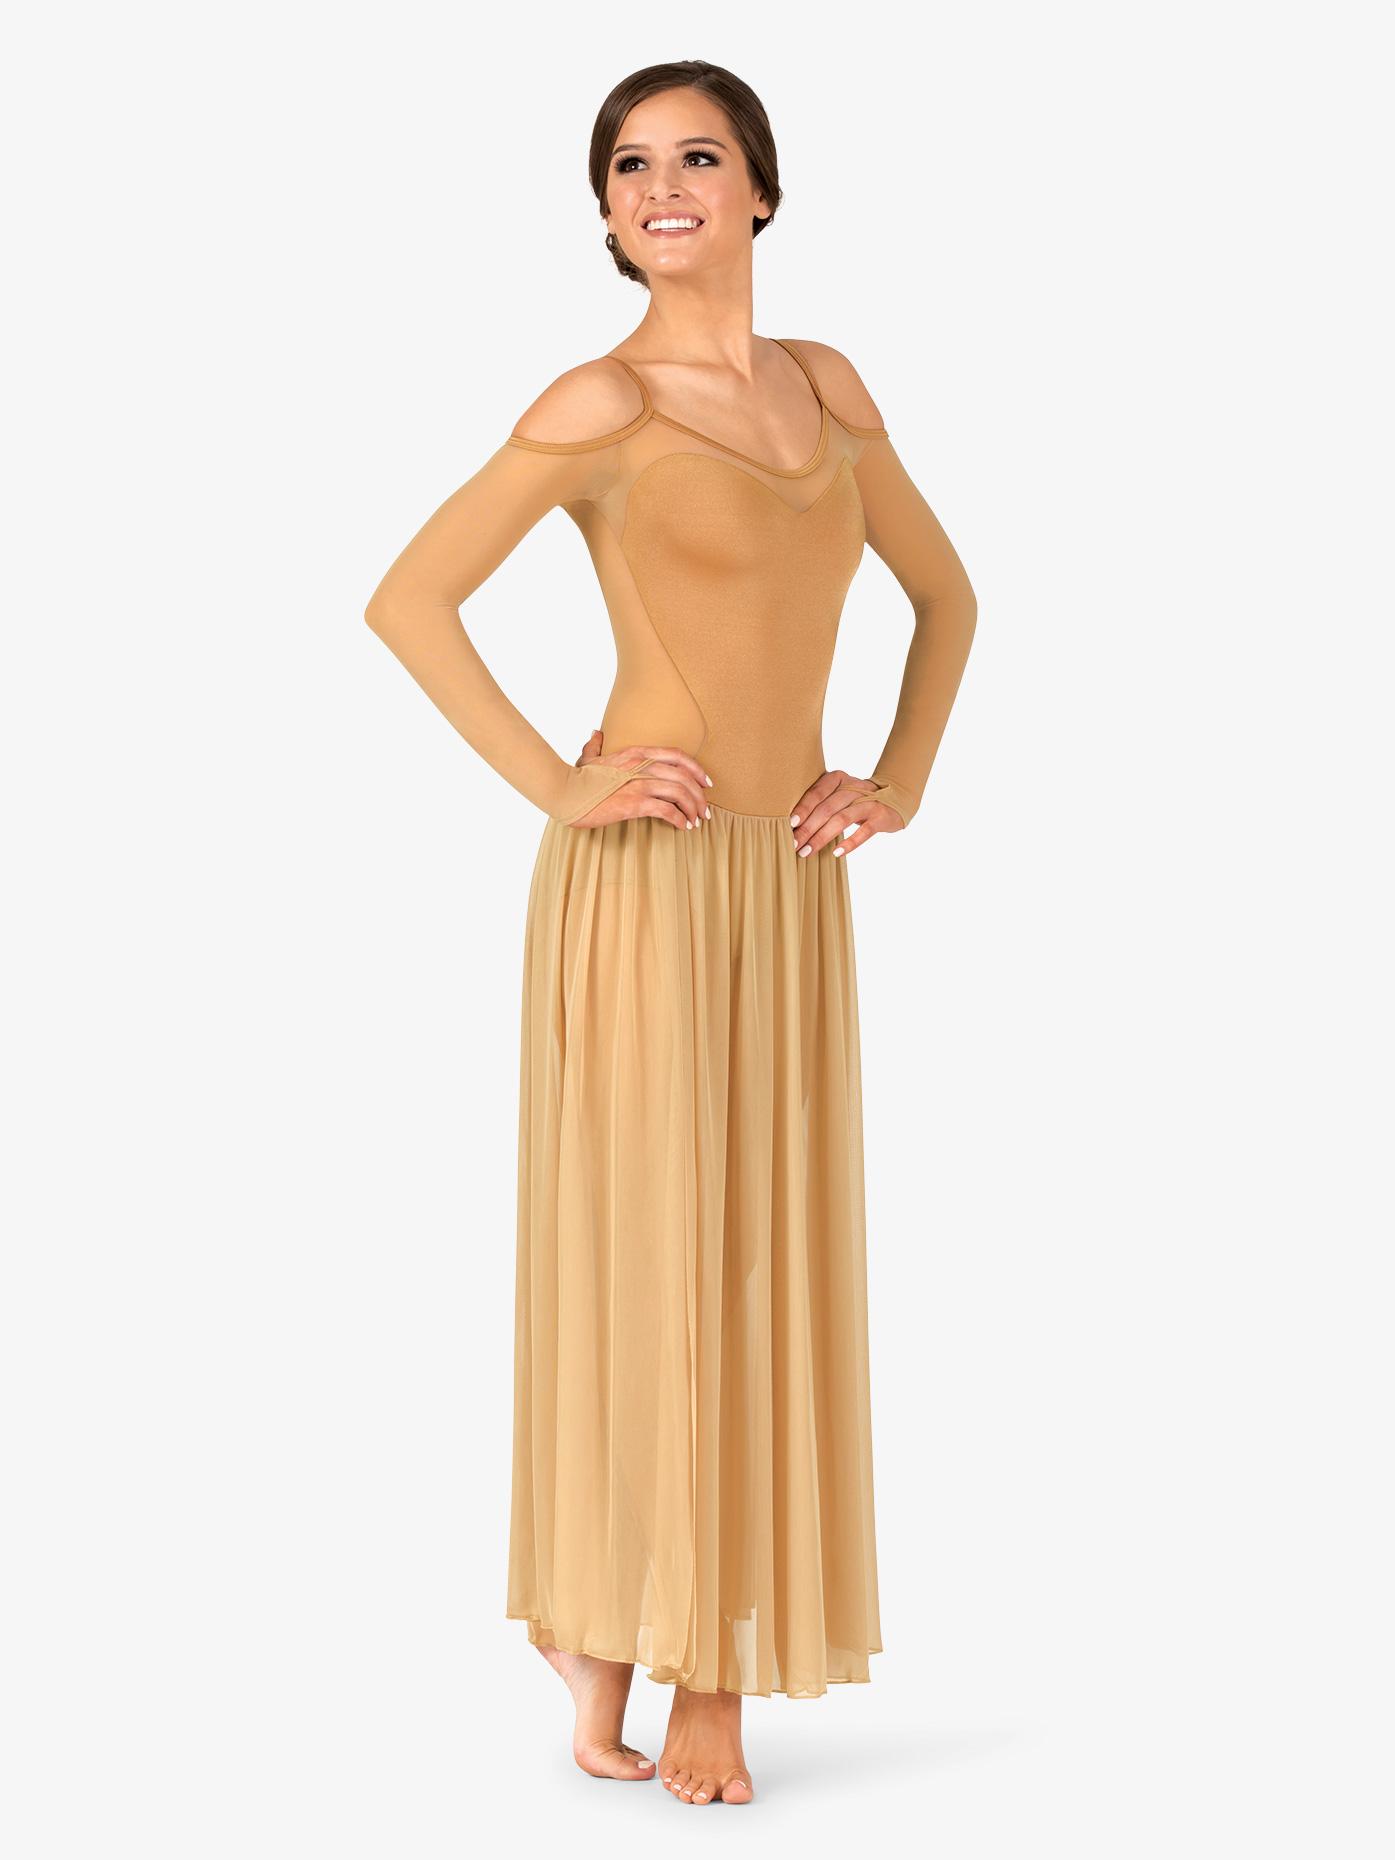 Double Platinum Womens Performance Open Shoulder Long Sleeve Dress N7700